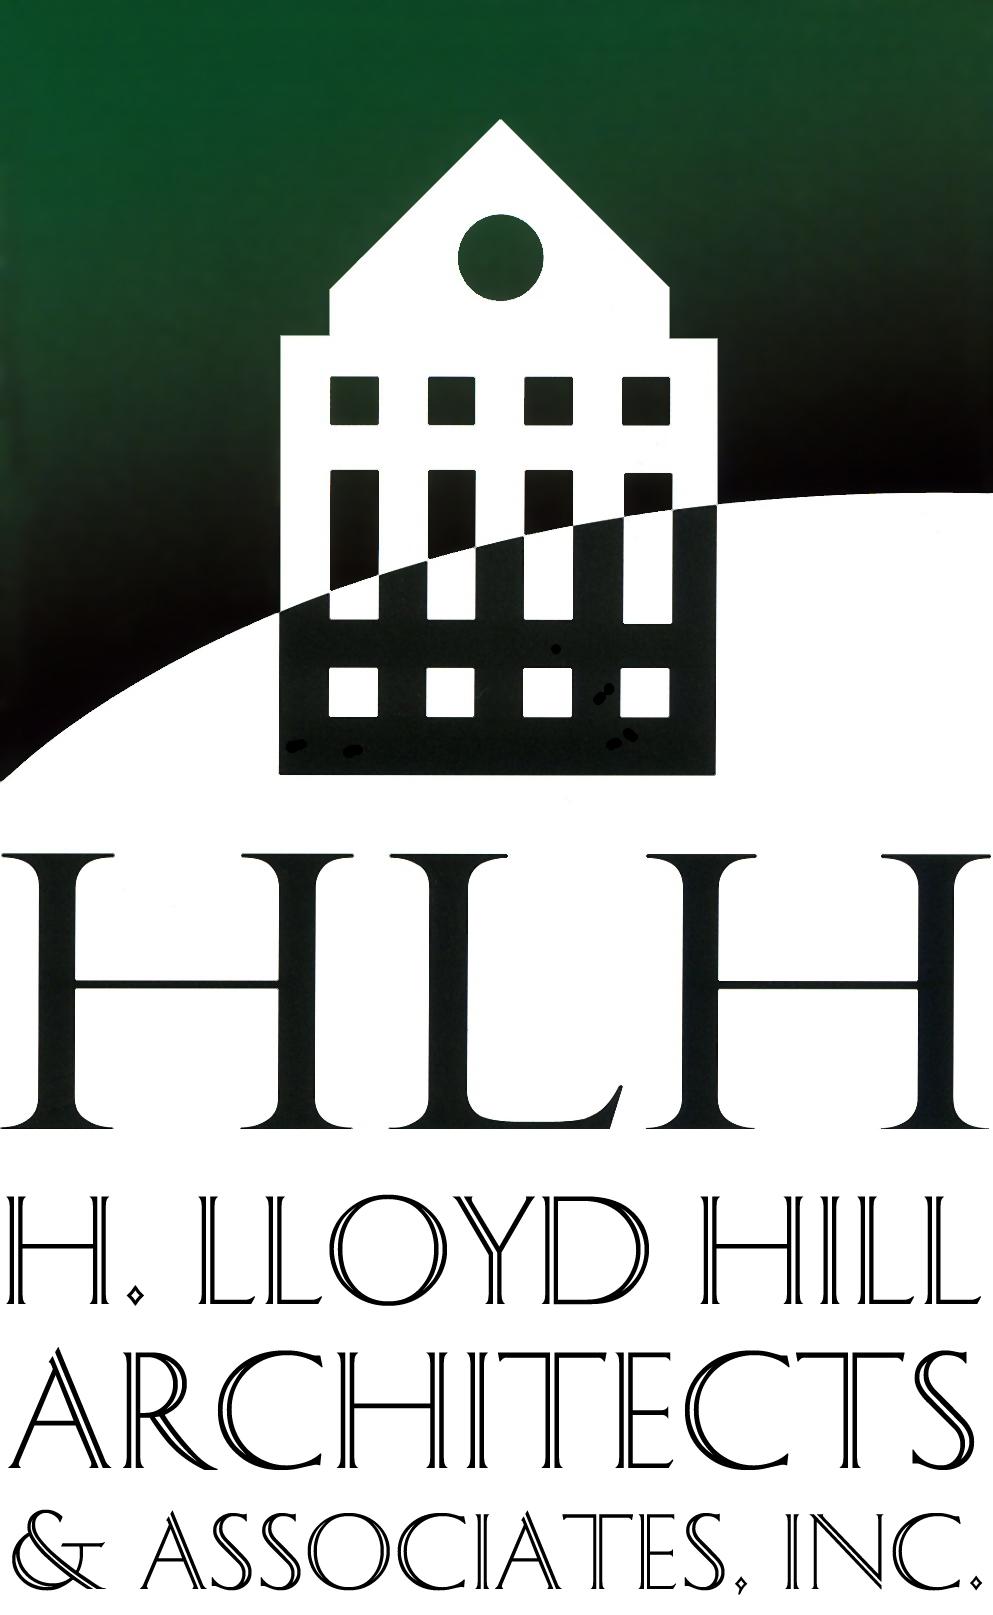 H. Lloyd Hill, Architects & Associates, Inc.